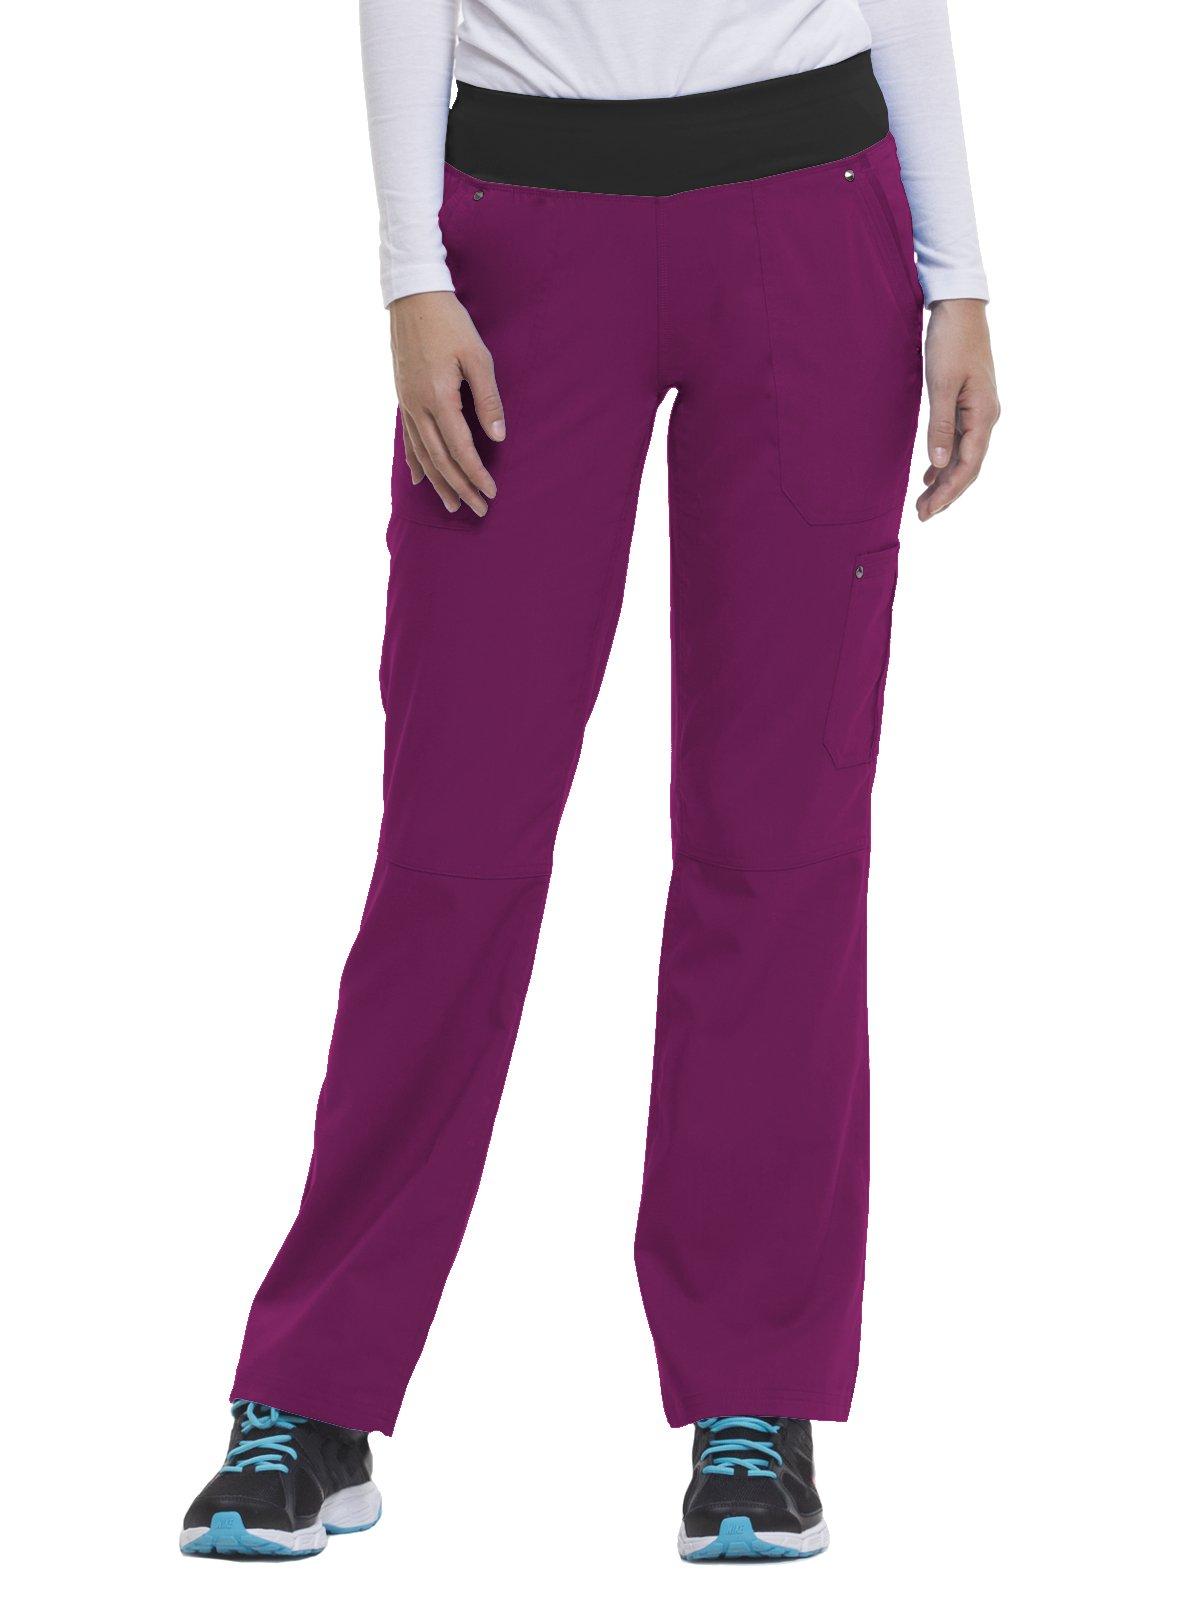 Purple Label by Healing Hands Scrubs Women's Tori 9133 5 Pocket Knit Waist Pant Punch Berry/Black- X-Large Petite